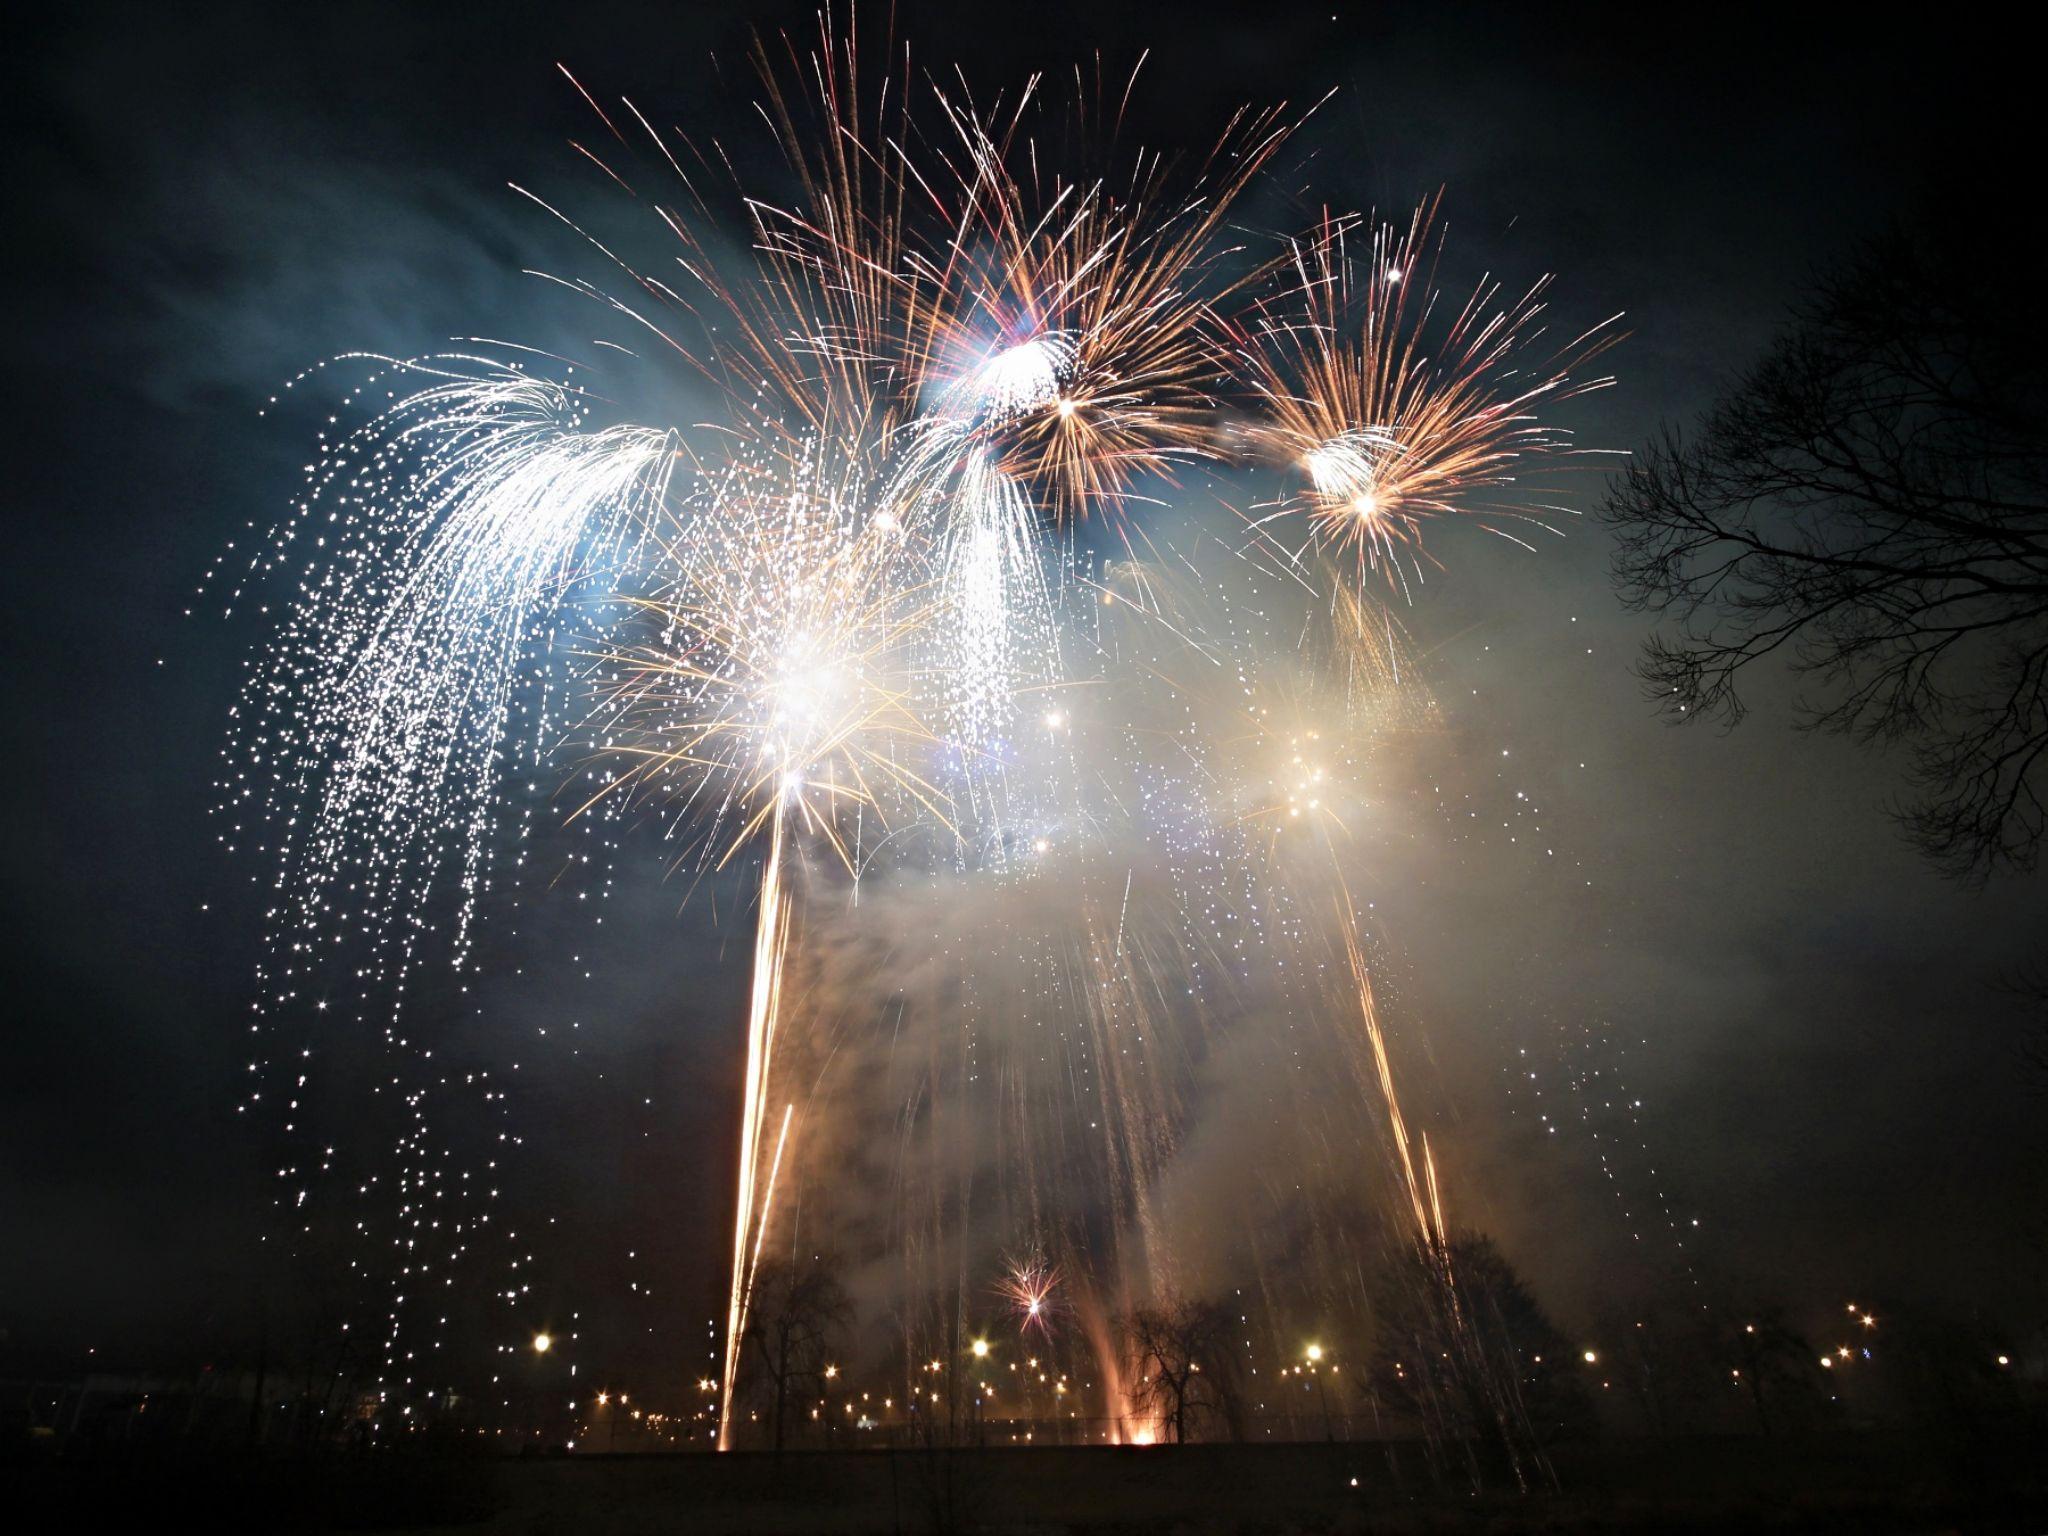 firework by Stenly Priesol